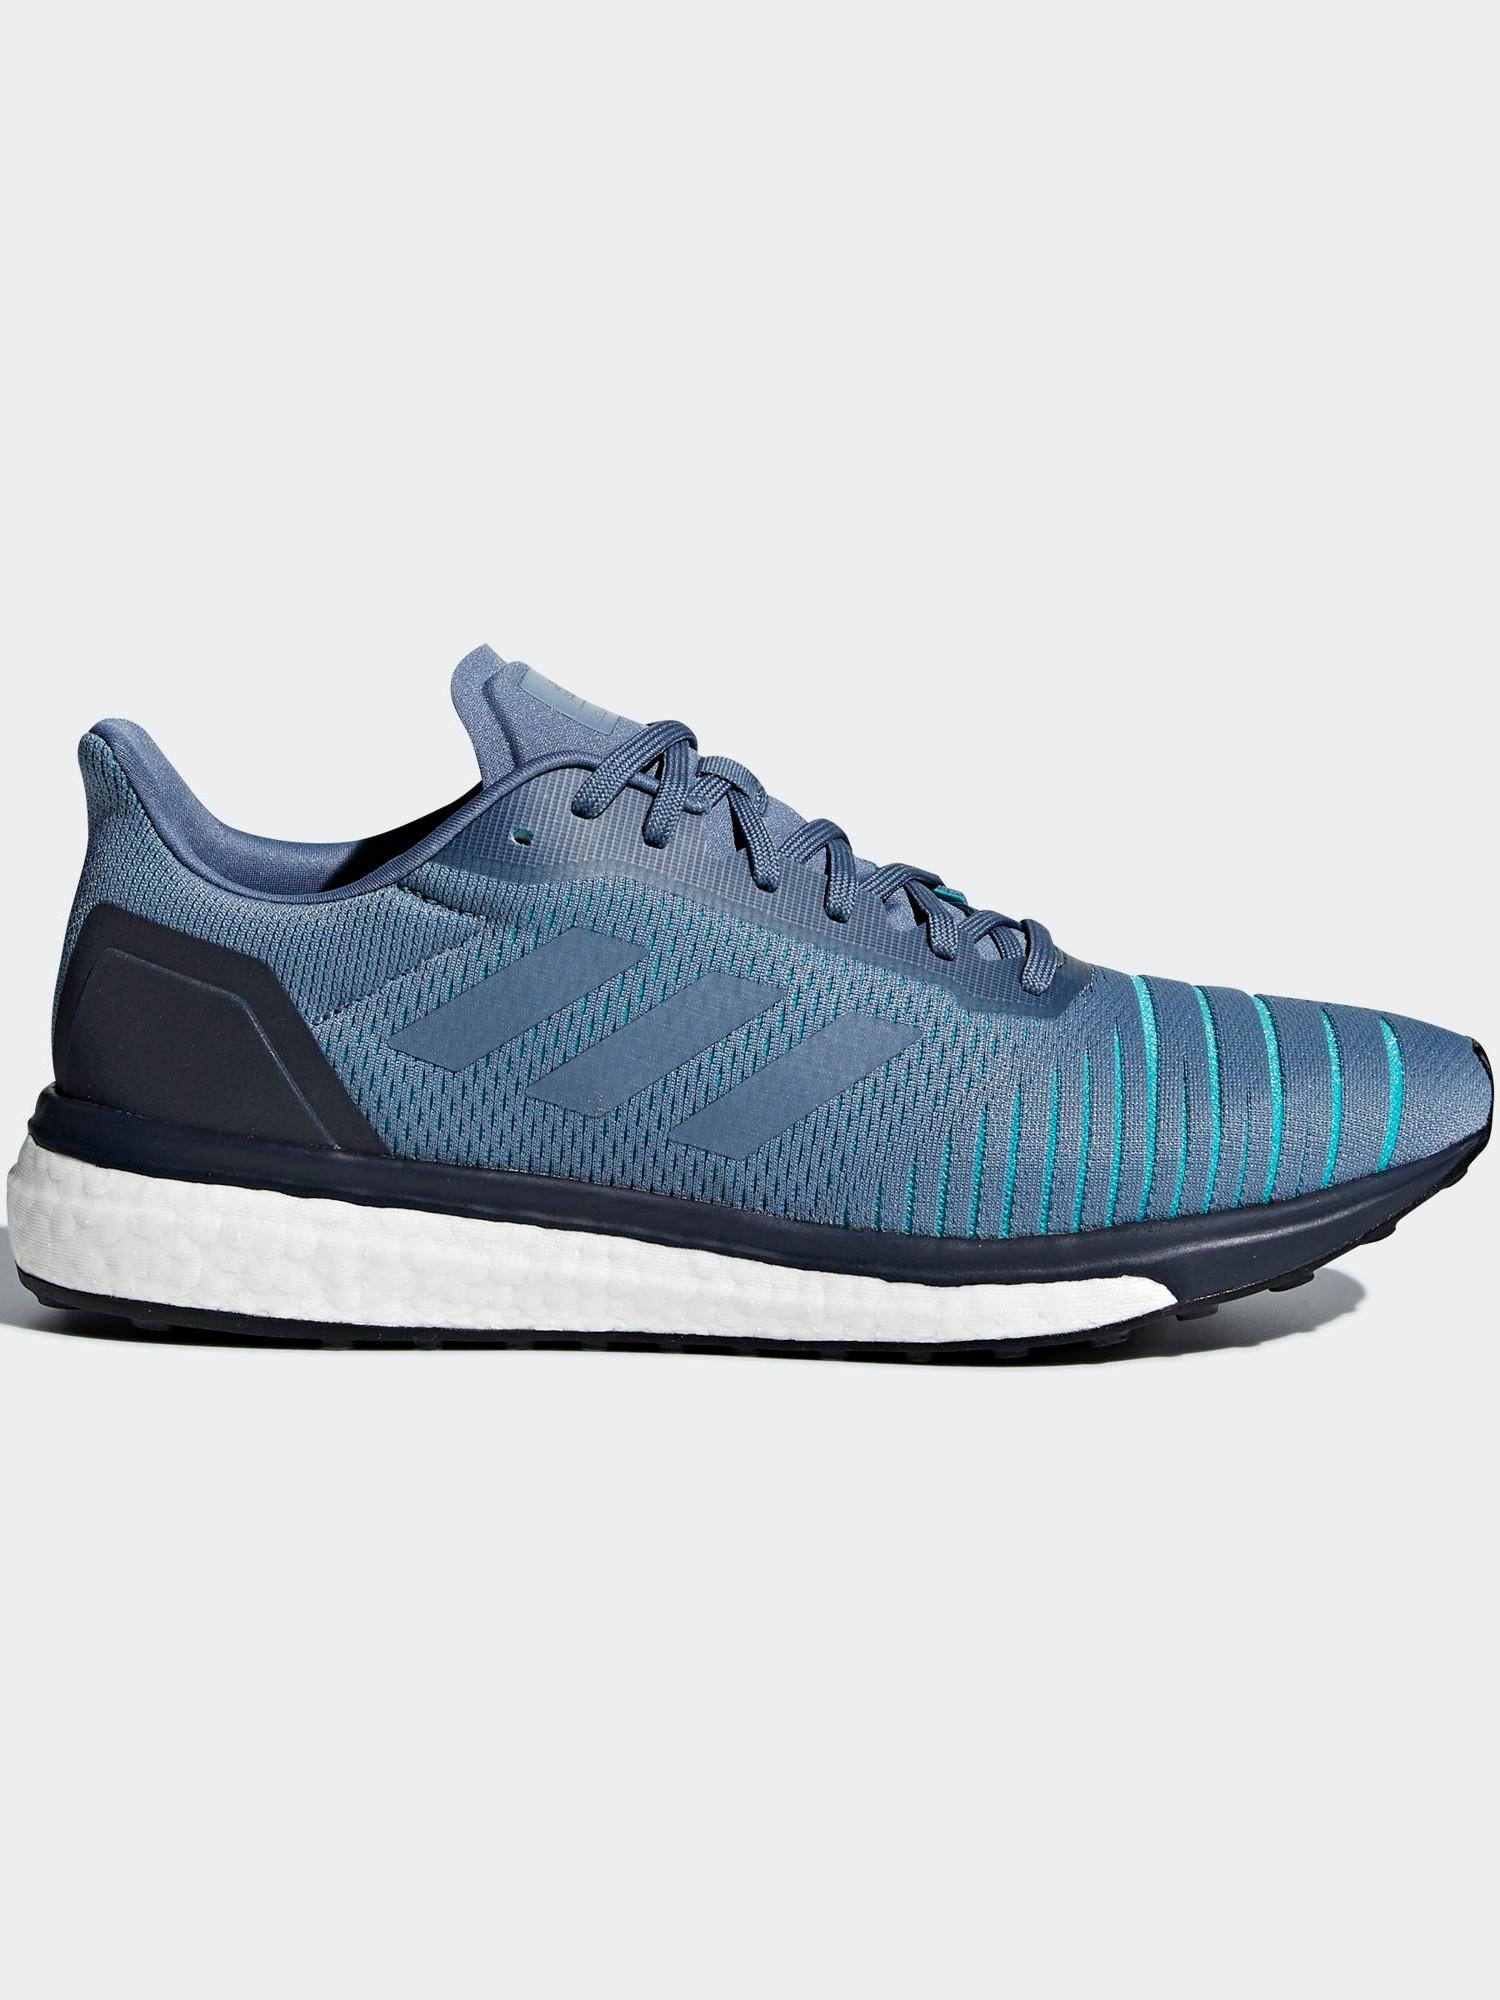 da ginnastica Running Scarpe Boost Drive Solar Blu Sneakers Adidas Corsa Scarpe Zd5PWPqwa